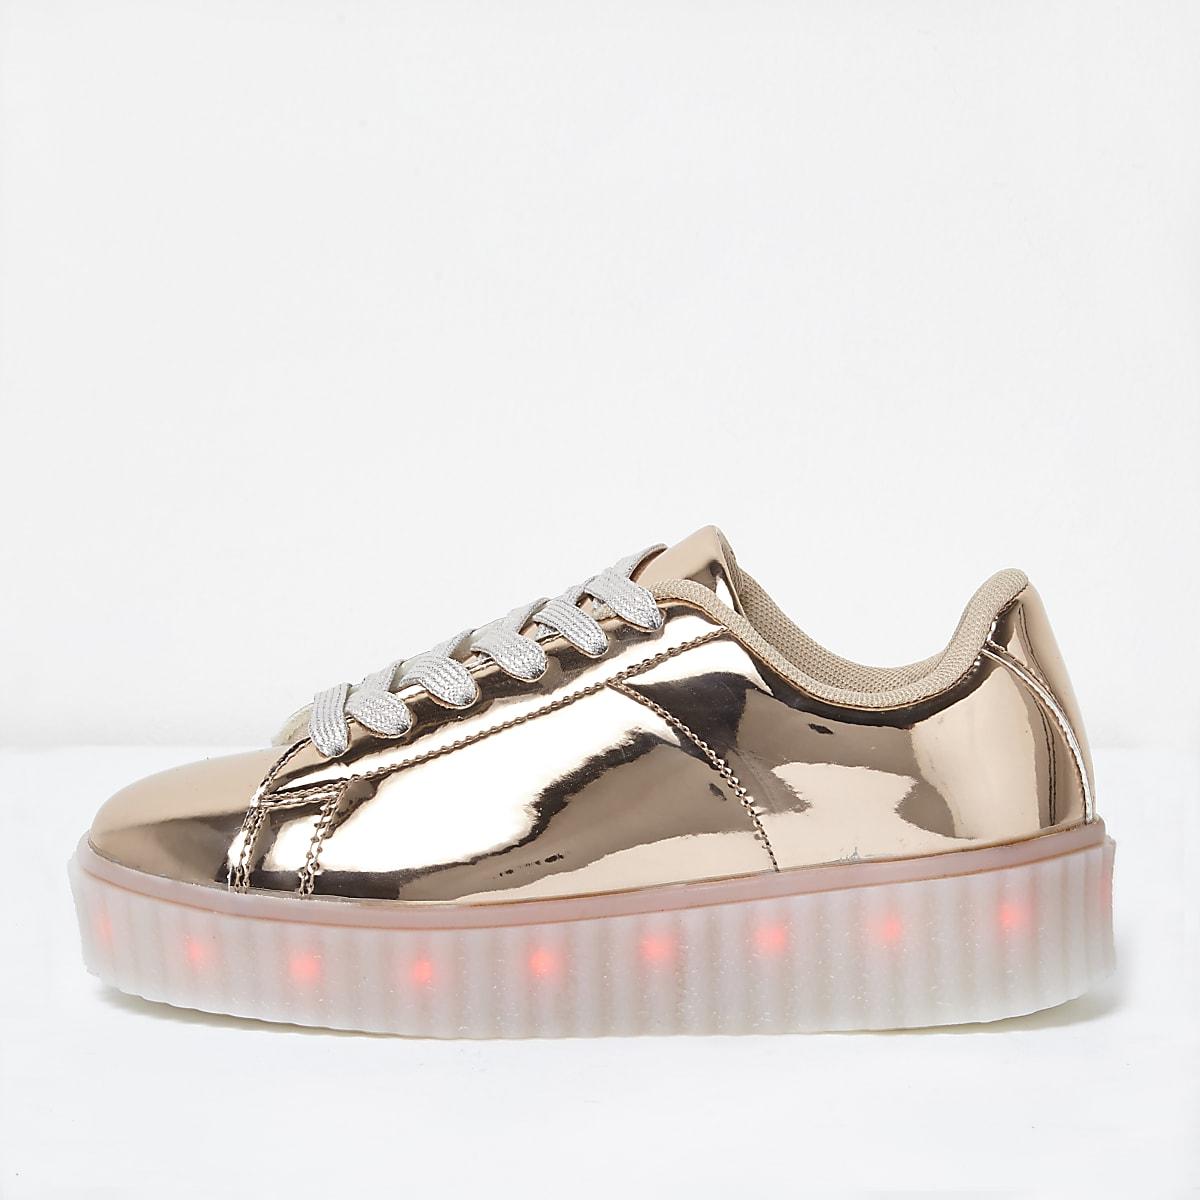 Girls rose gold LED flashing trainer